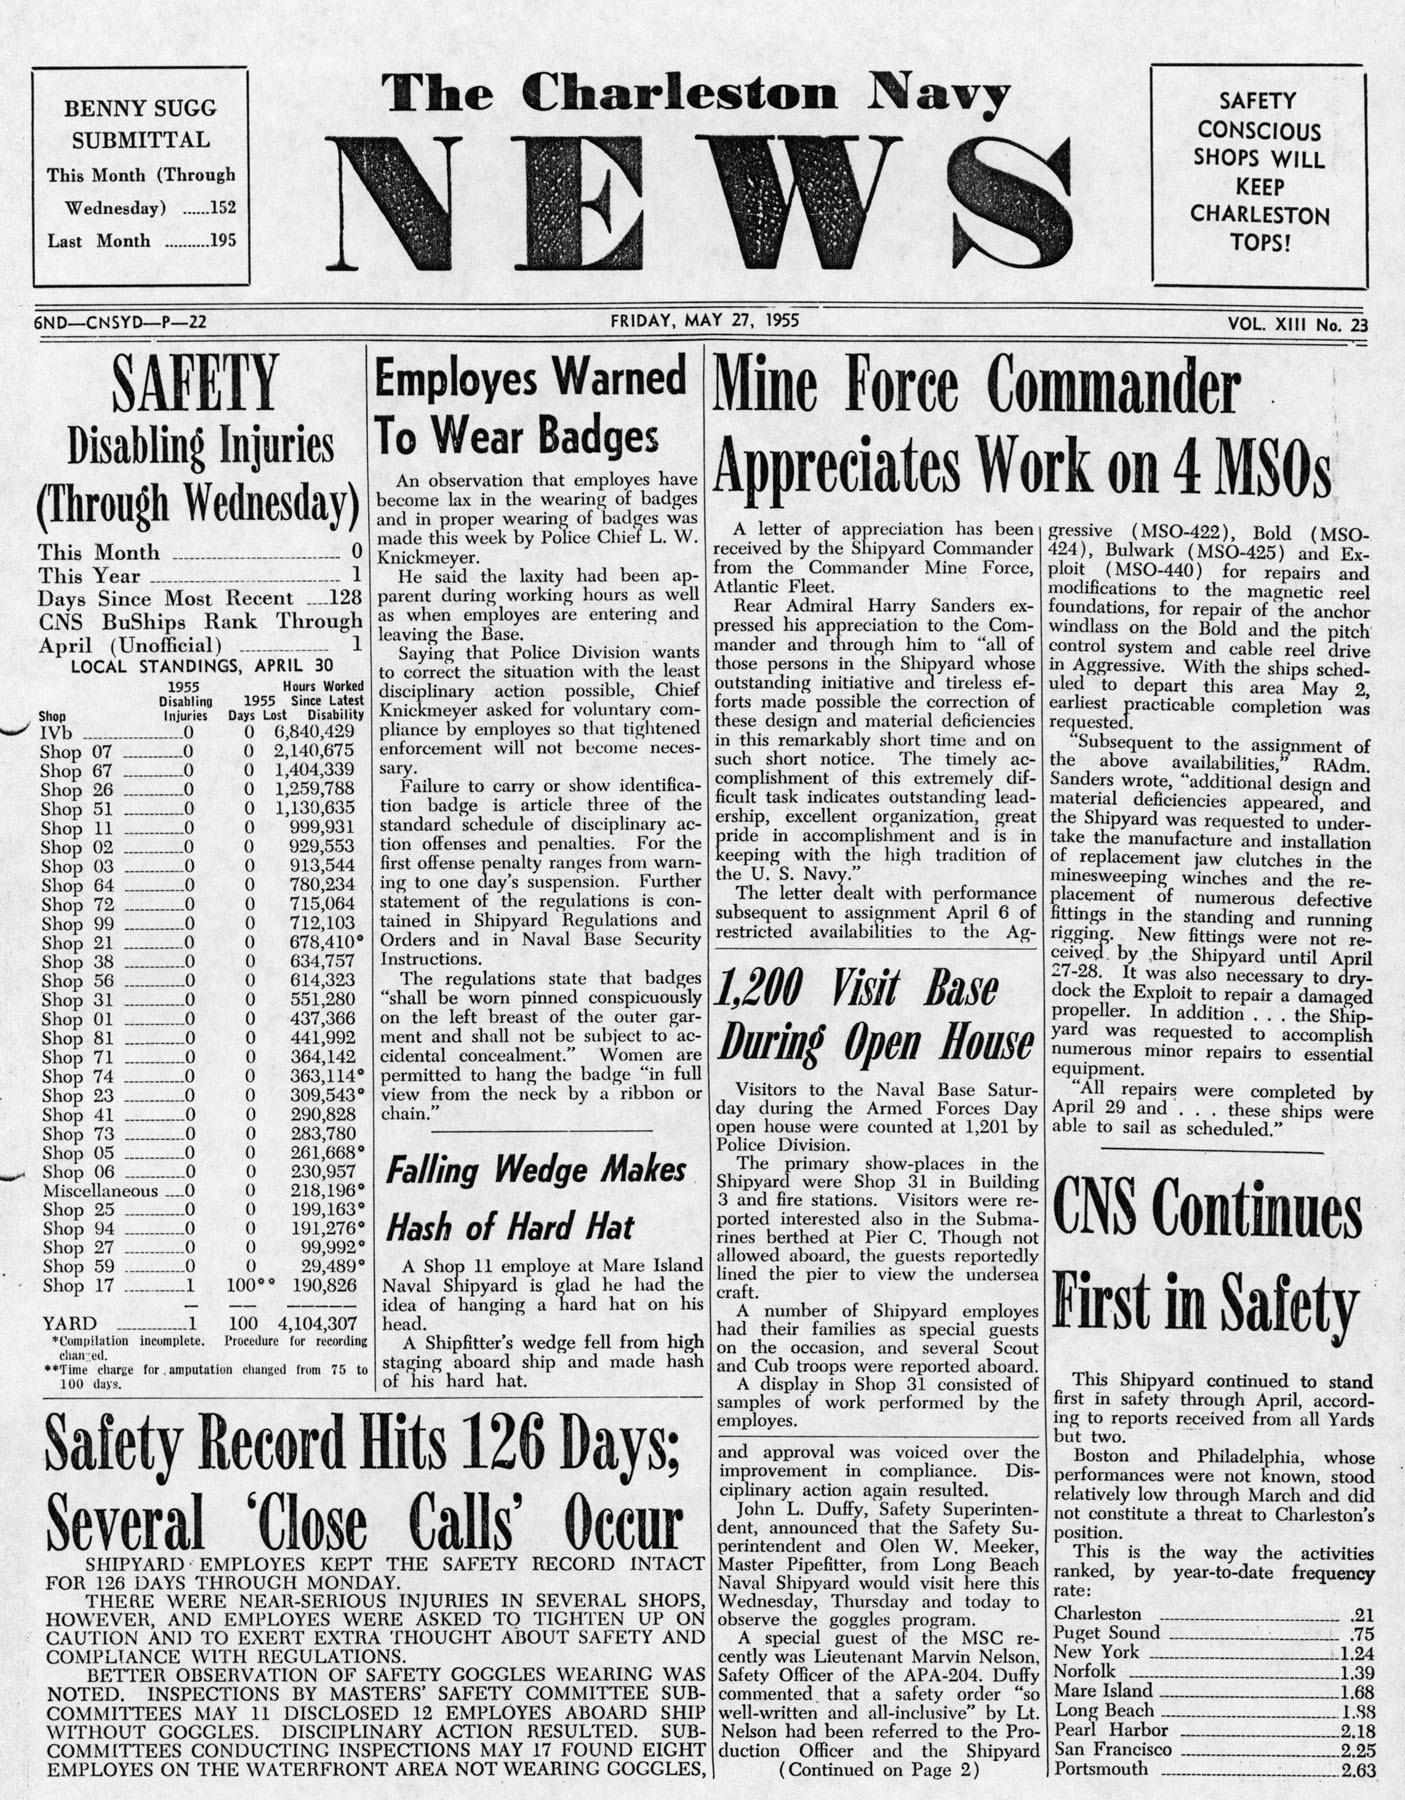 The Charleston Navy News, Volume 13, Edition 23, page i